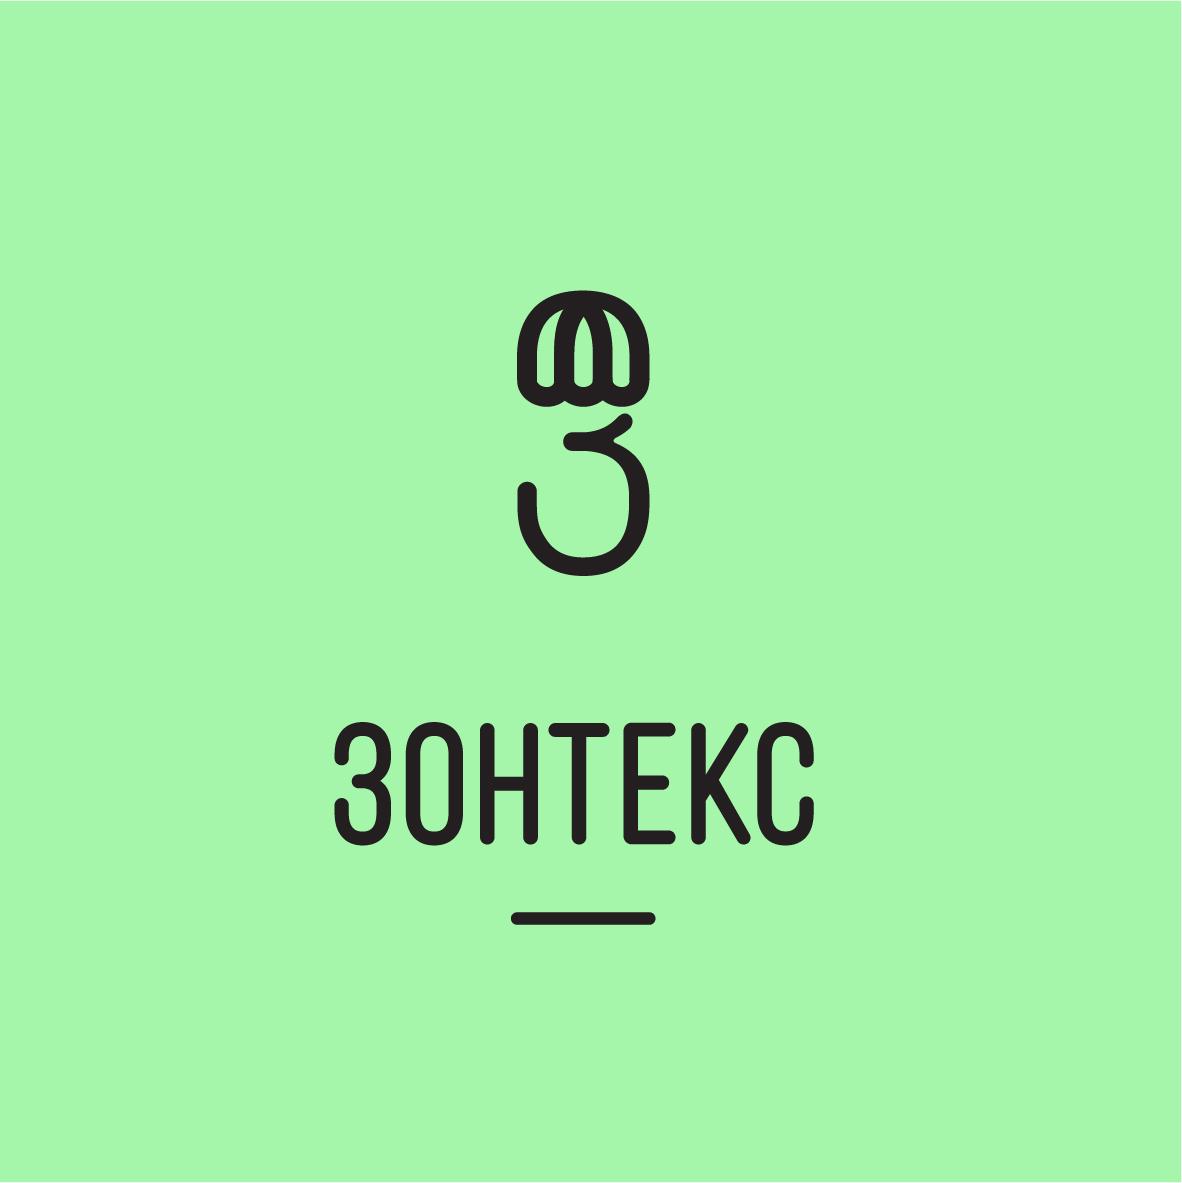 Логотип для интернет проекта фото f_4025a302aad186d0.jpg